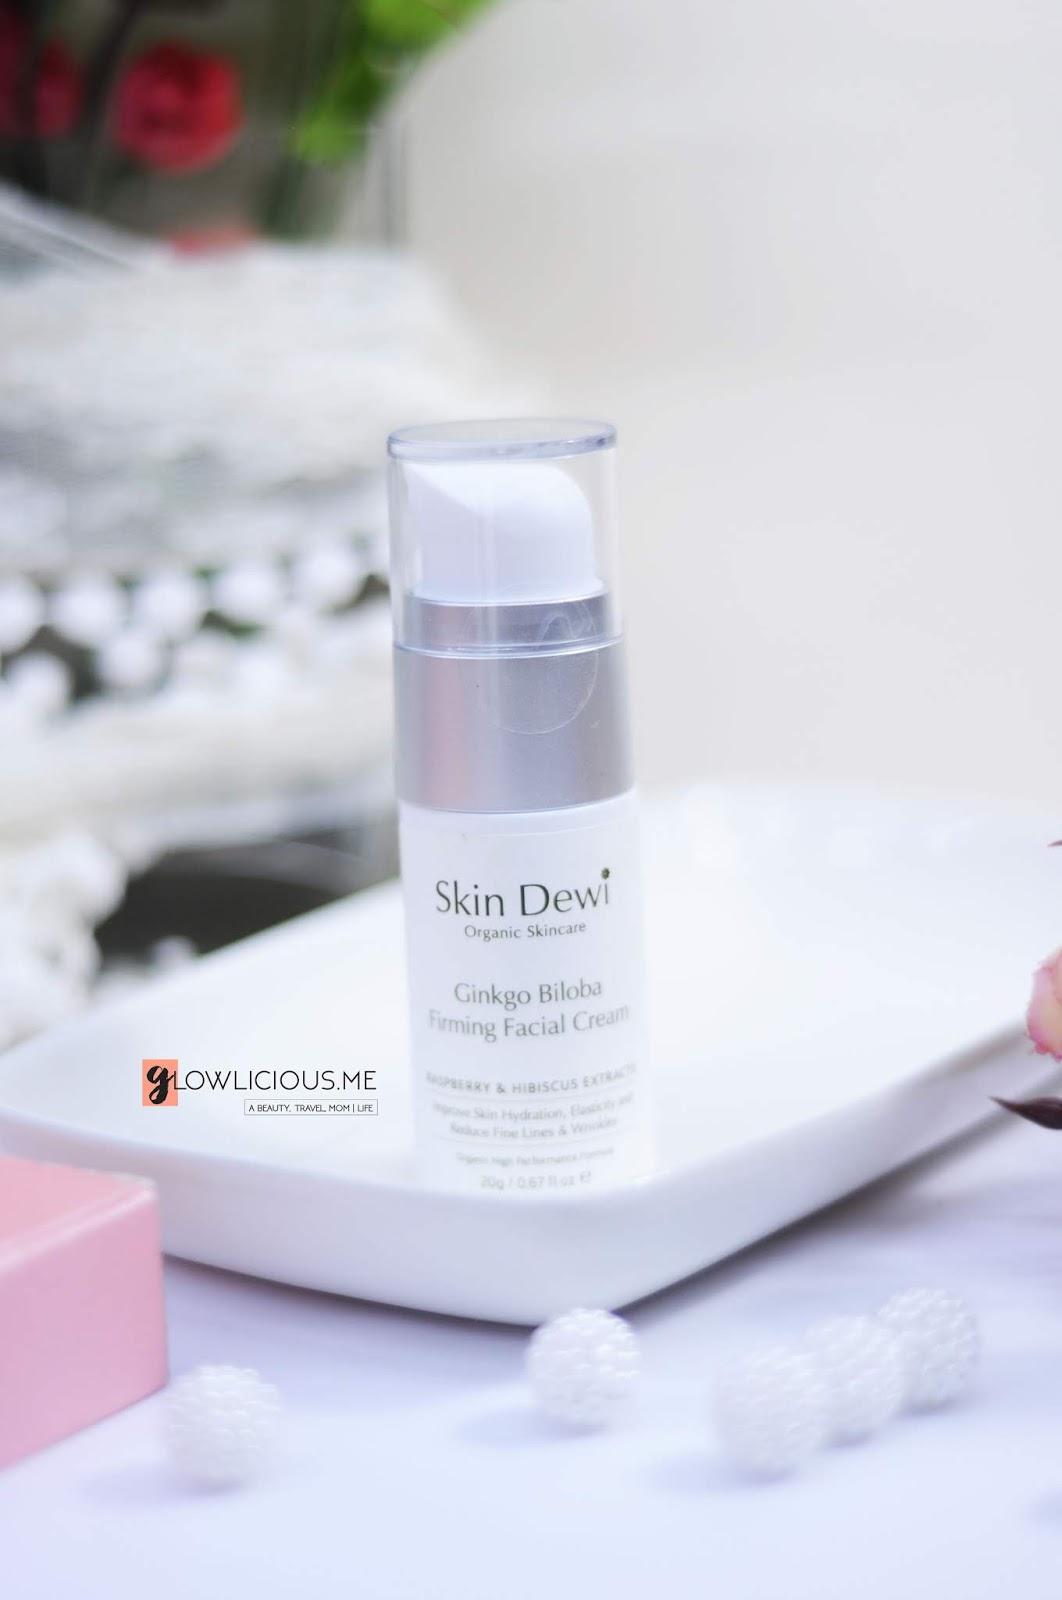 SkinDewi Ginkgo Biloba Firming Facial Cream 20g